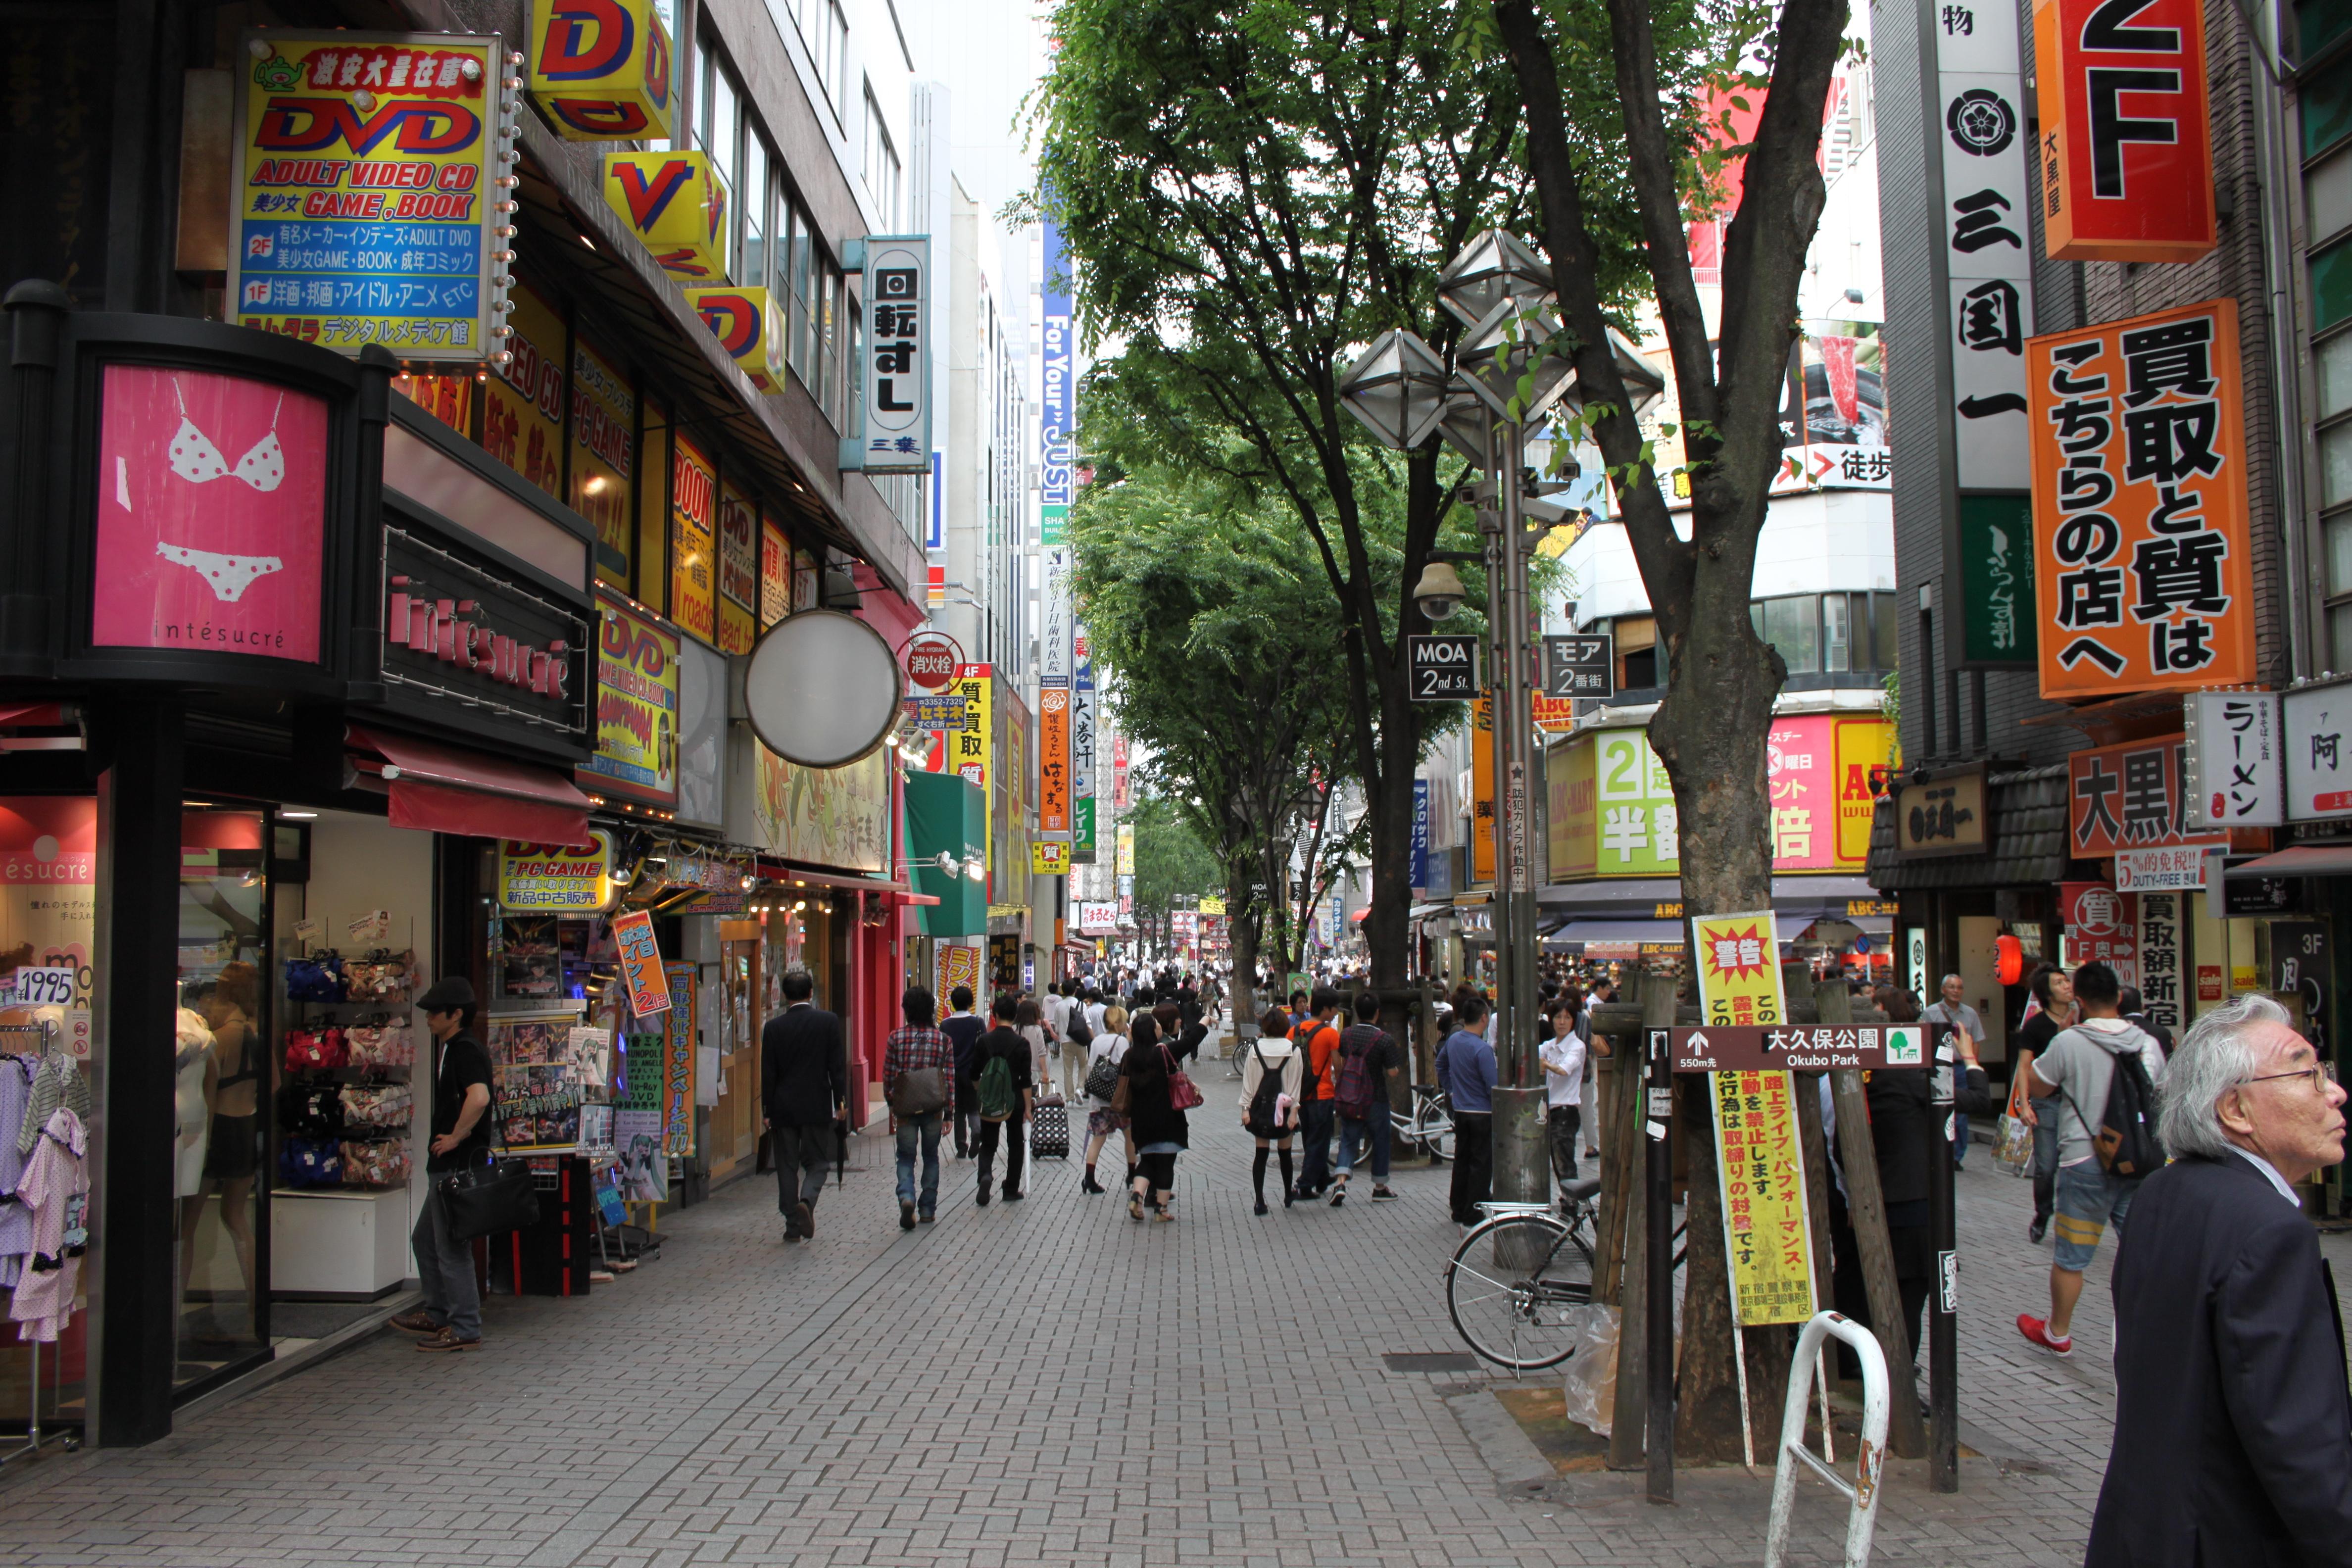 5 Tage in Tokio - Shinjuku